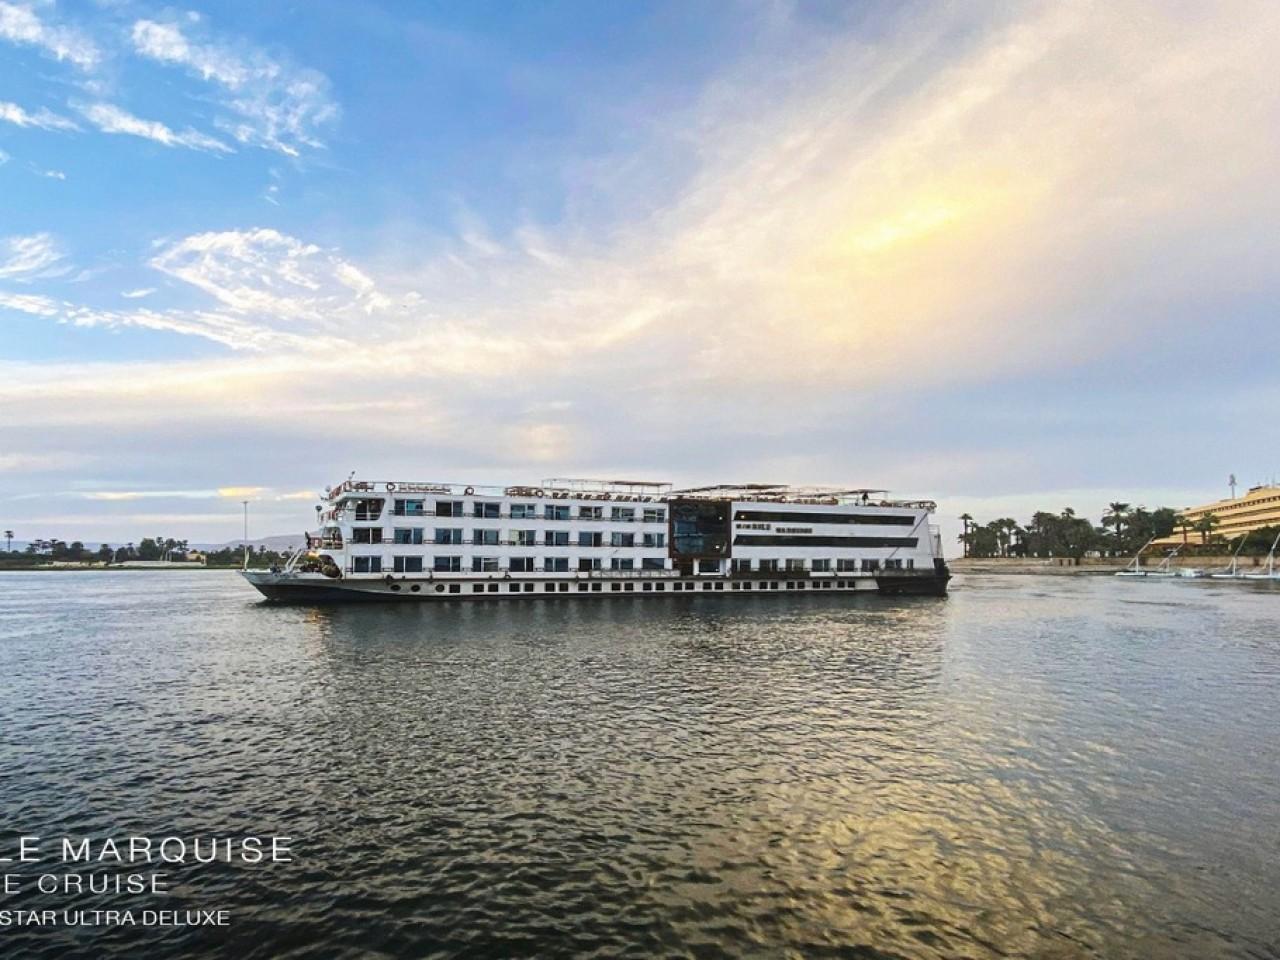 Marquise Nile Cruise With Transportation